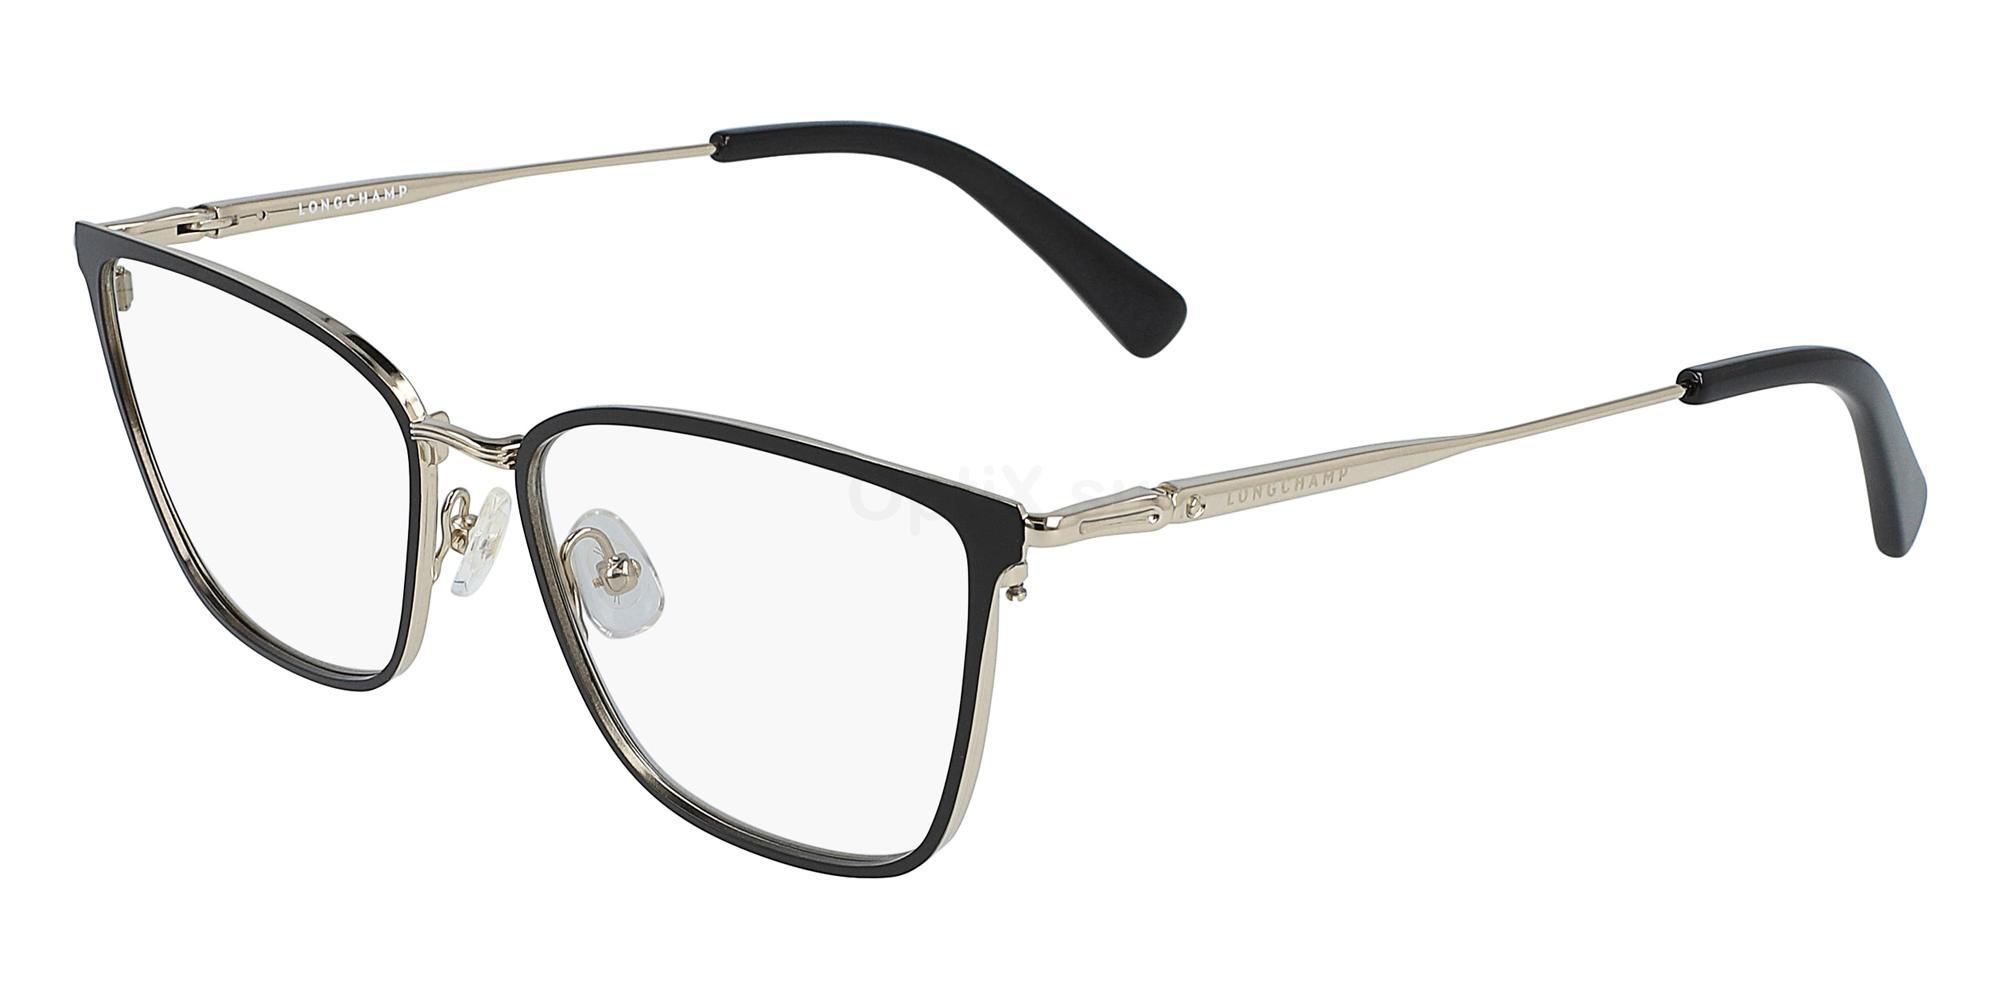 001 LO2125 Glasses, LONGCHAMP